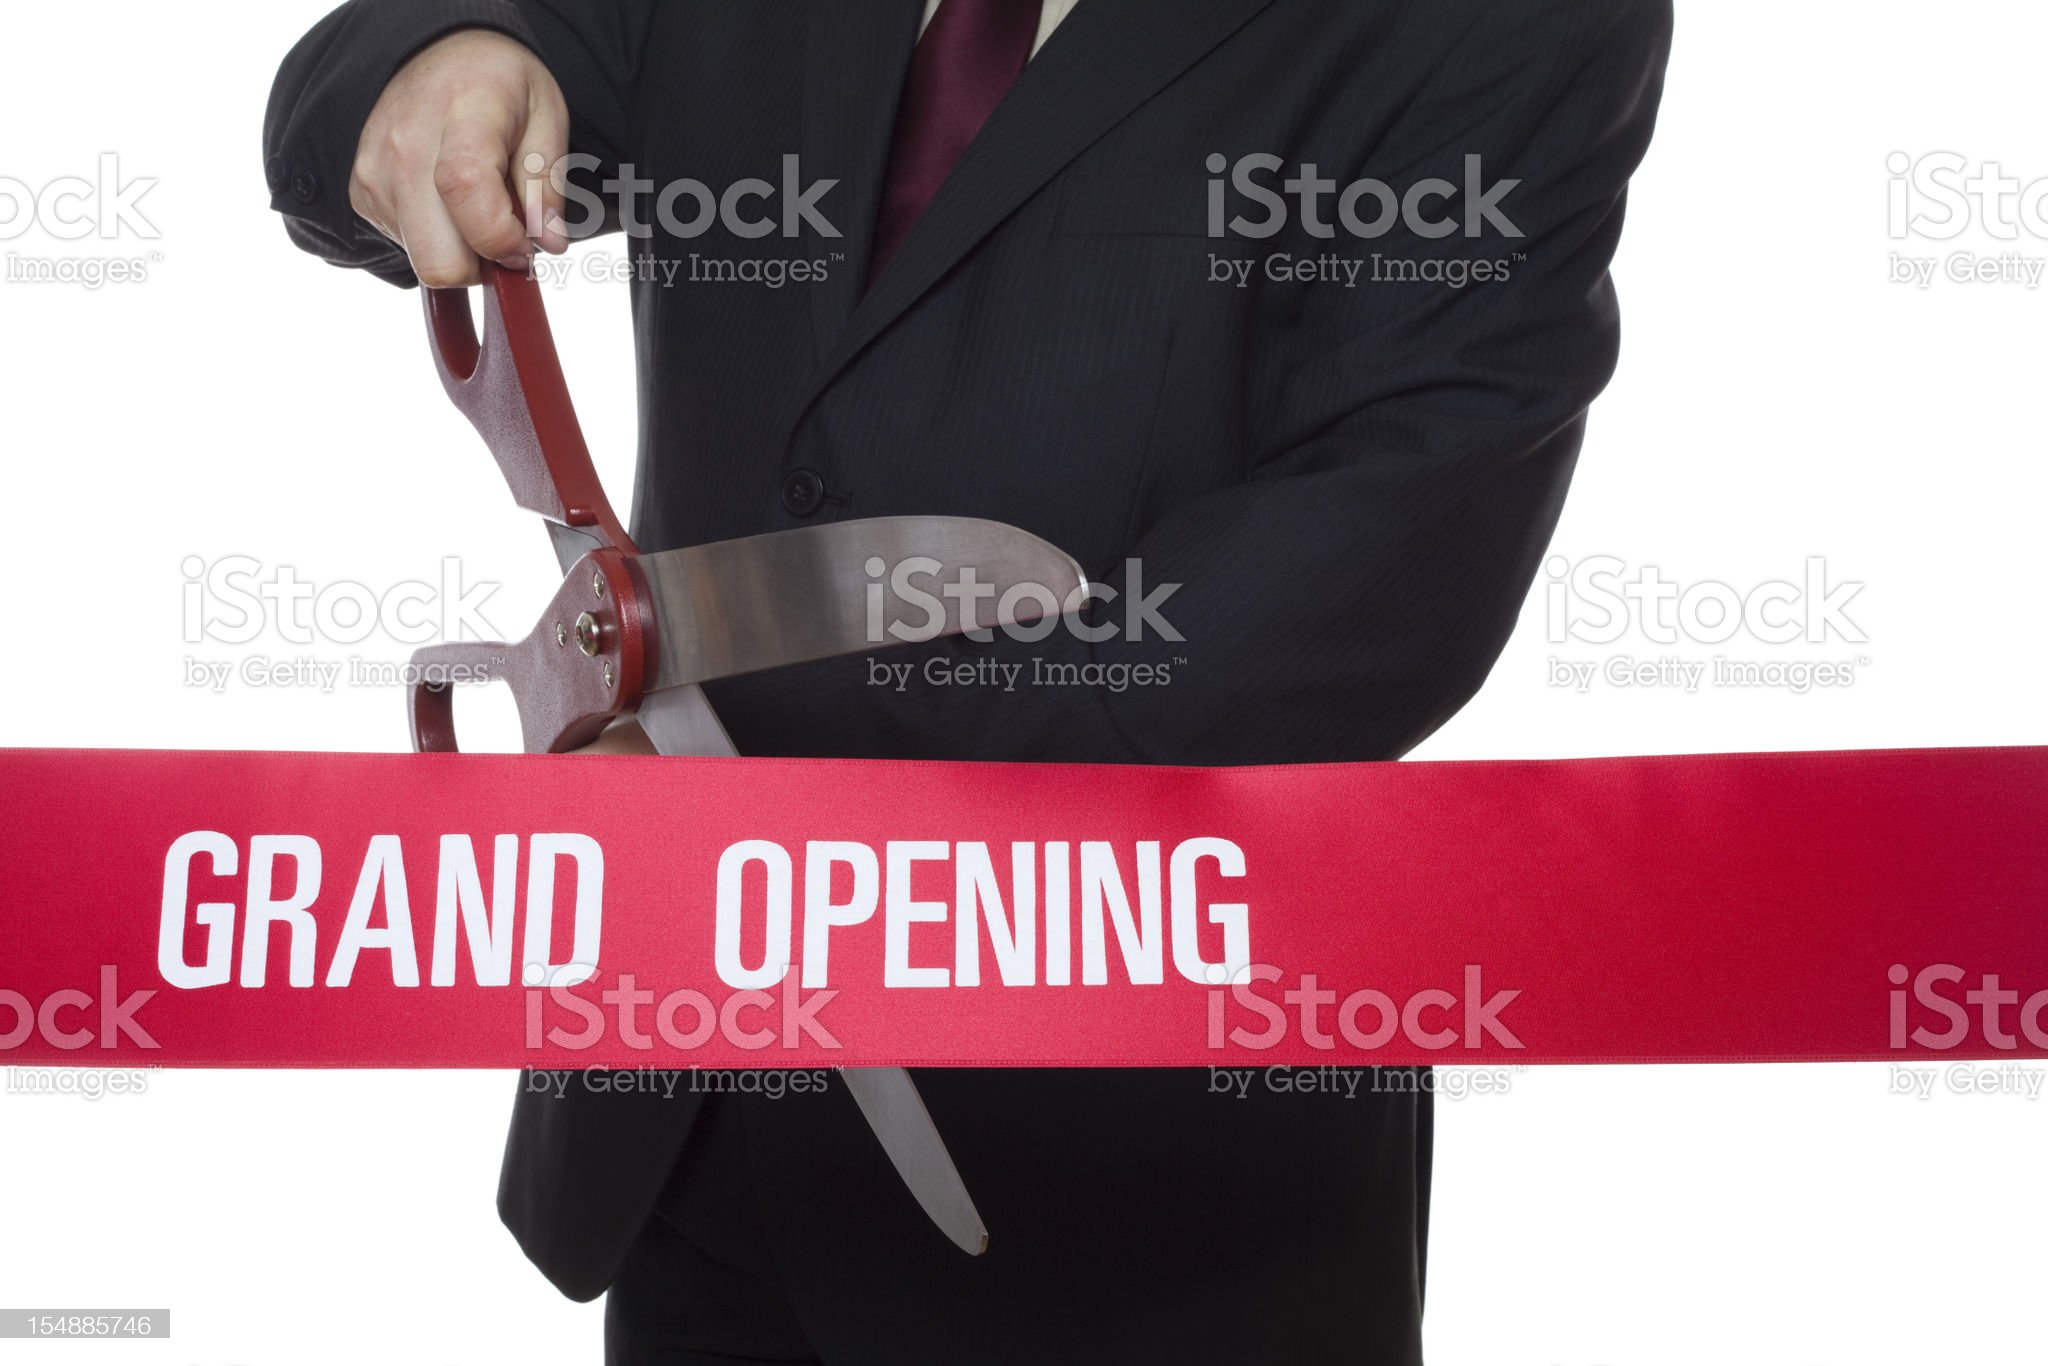 Ribbon cutting ceremony royalty-free stock photo